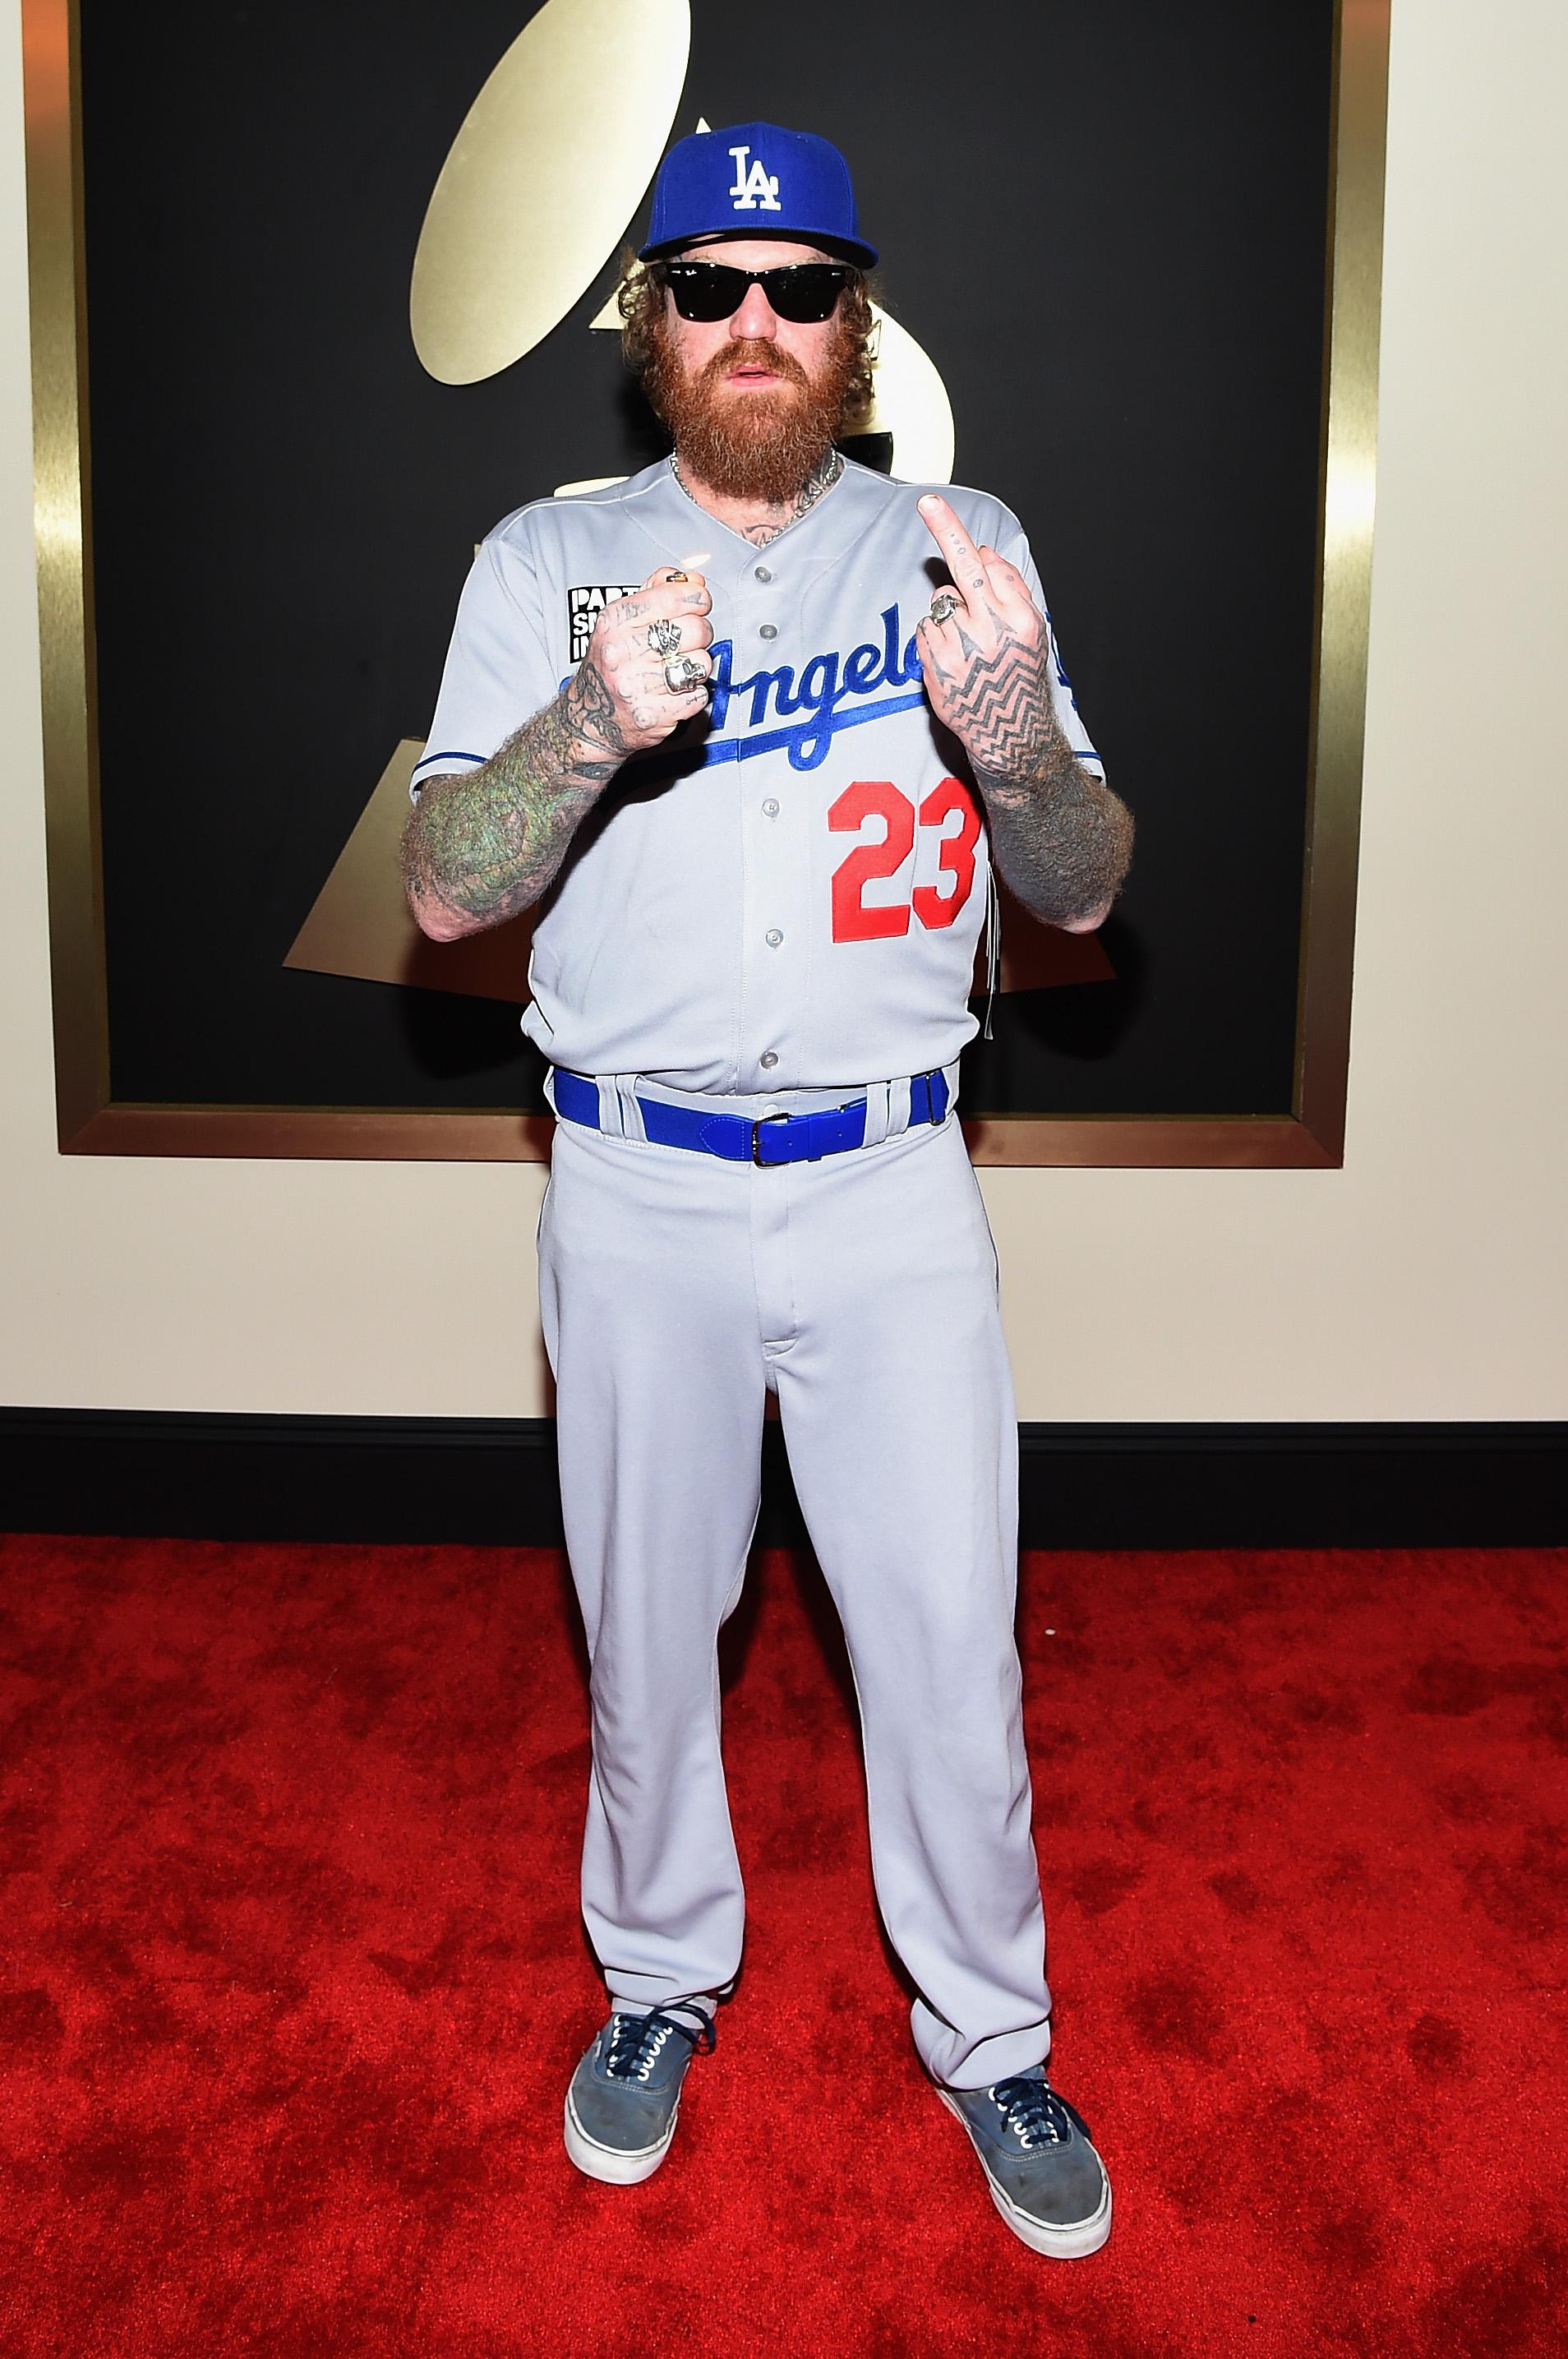 Brett Hinds Of Mastodon Wears Dodgers Uniform To Grammy Awards